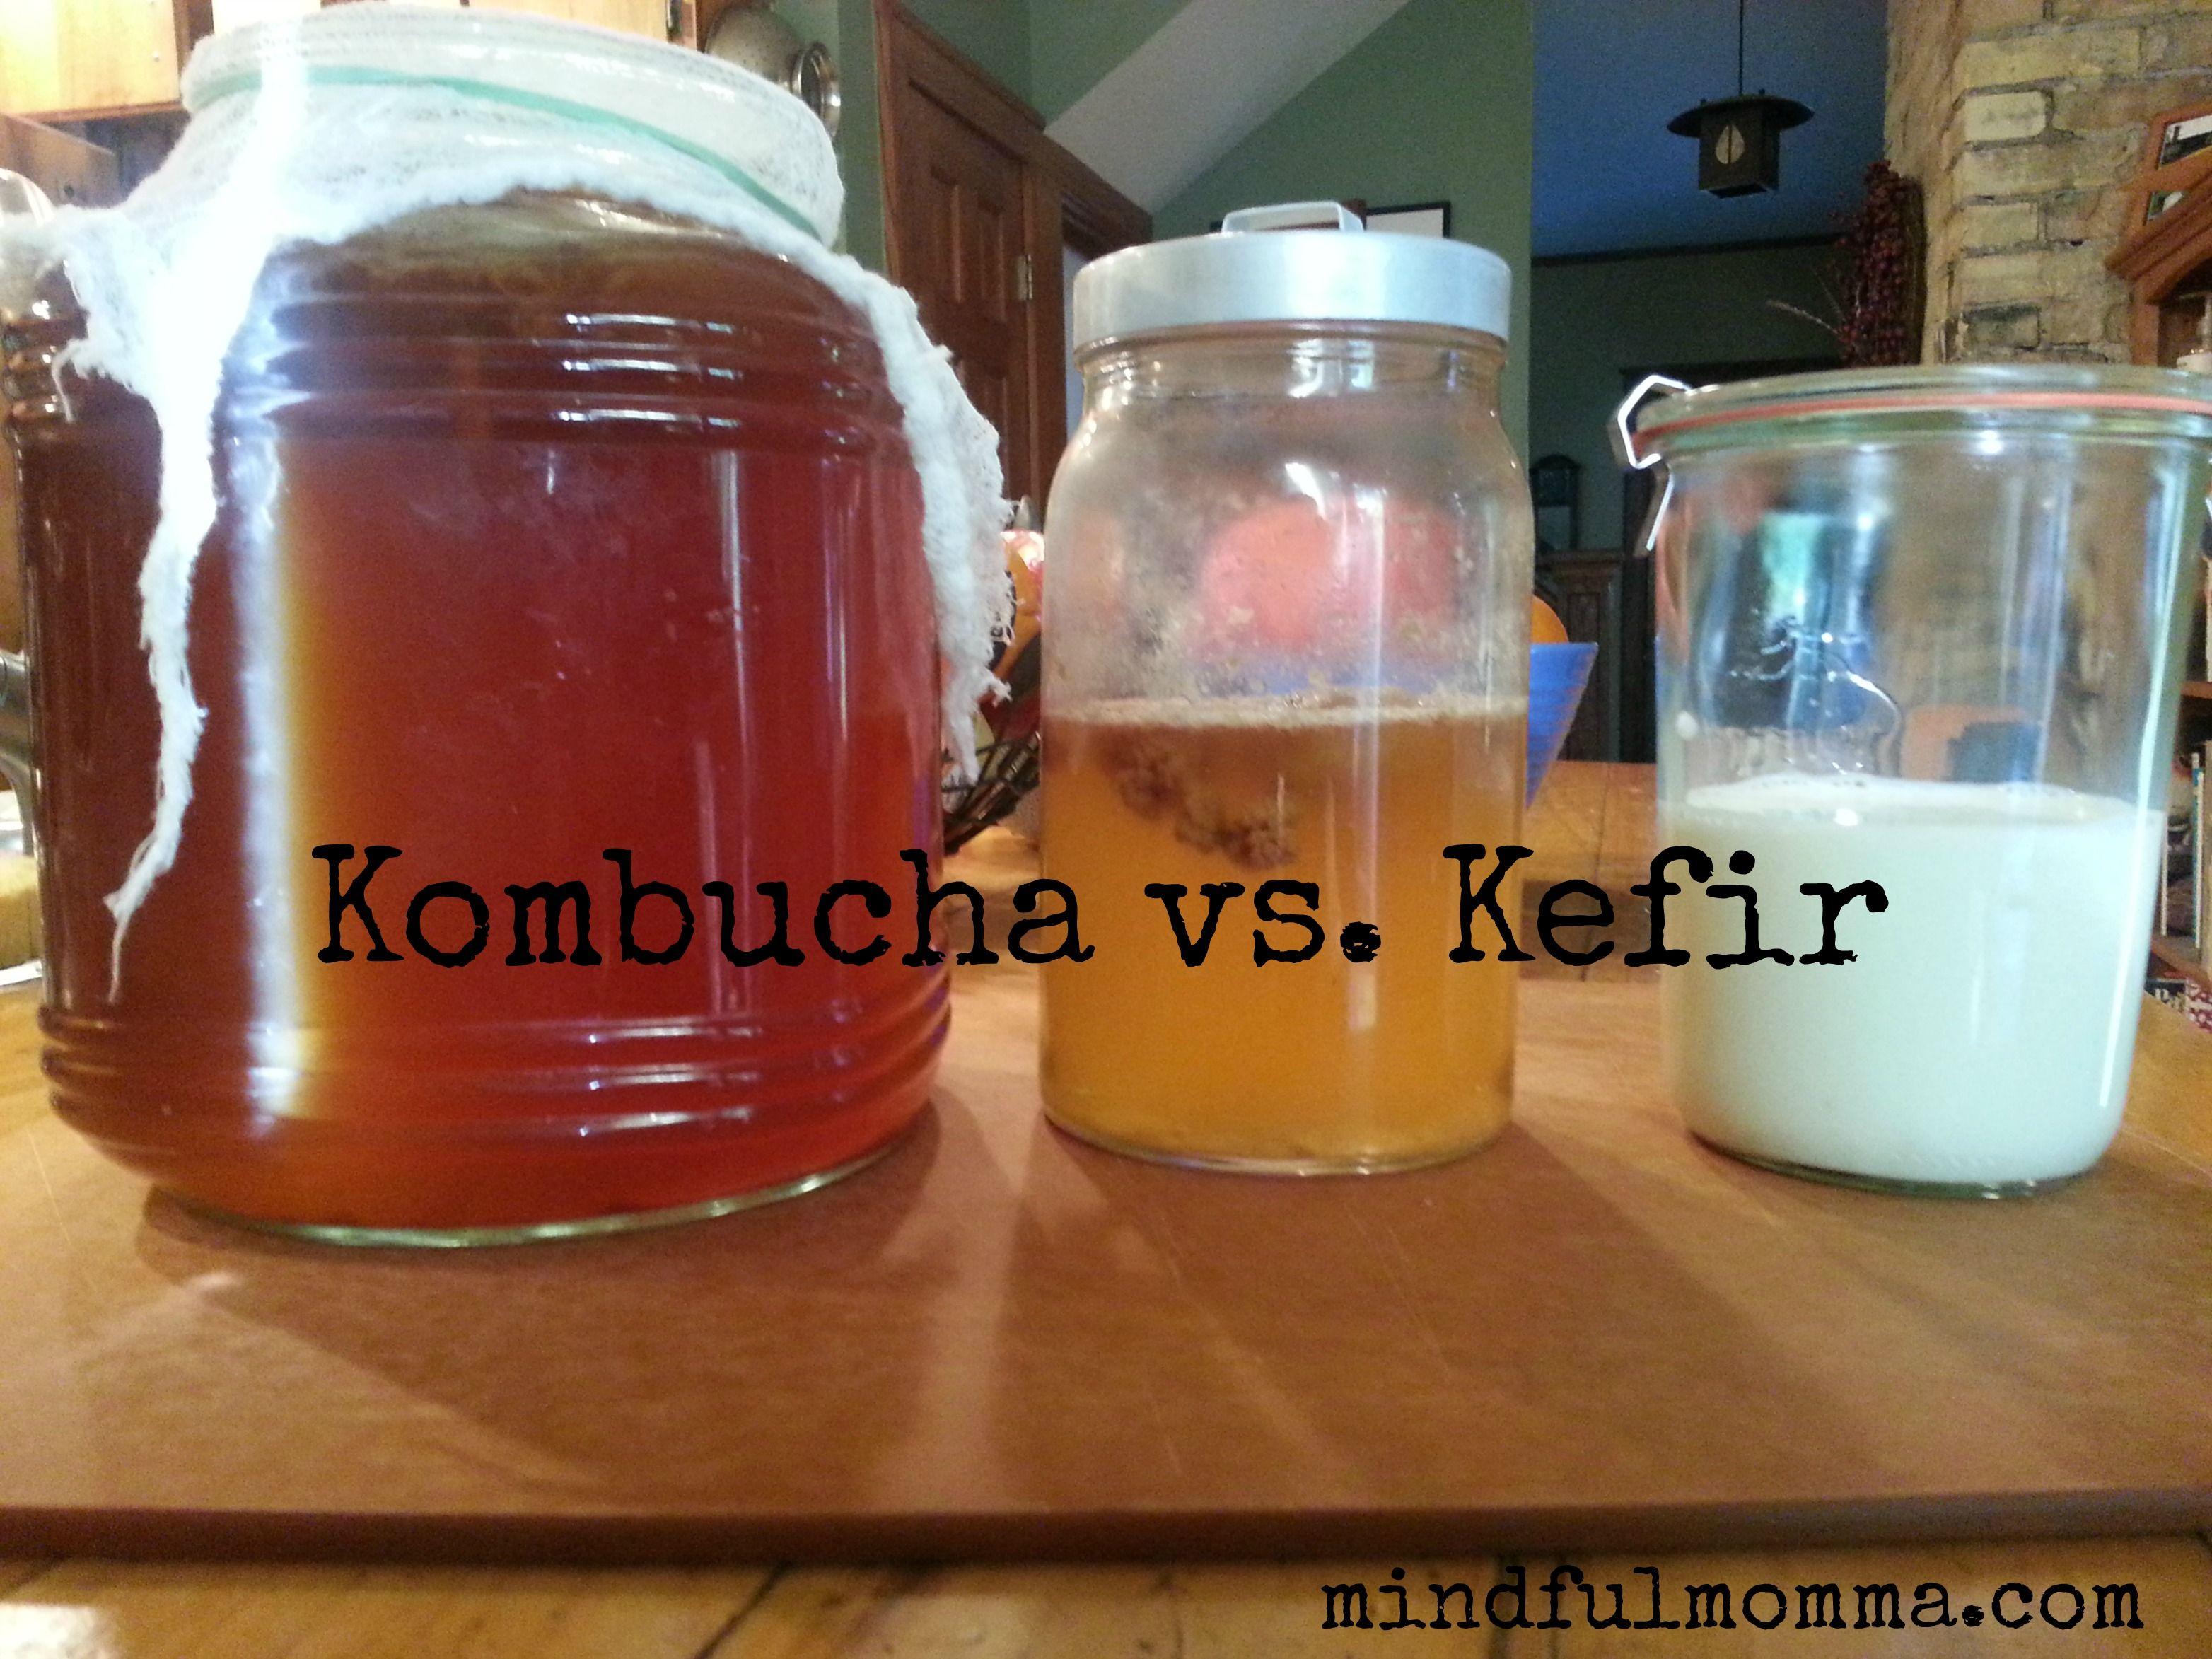 Kombucha Vs Kefir Similarities And Differences And How To Make Them With Images Kombucha Kefir Kefir Benefits